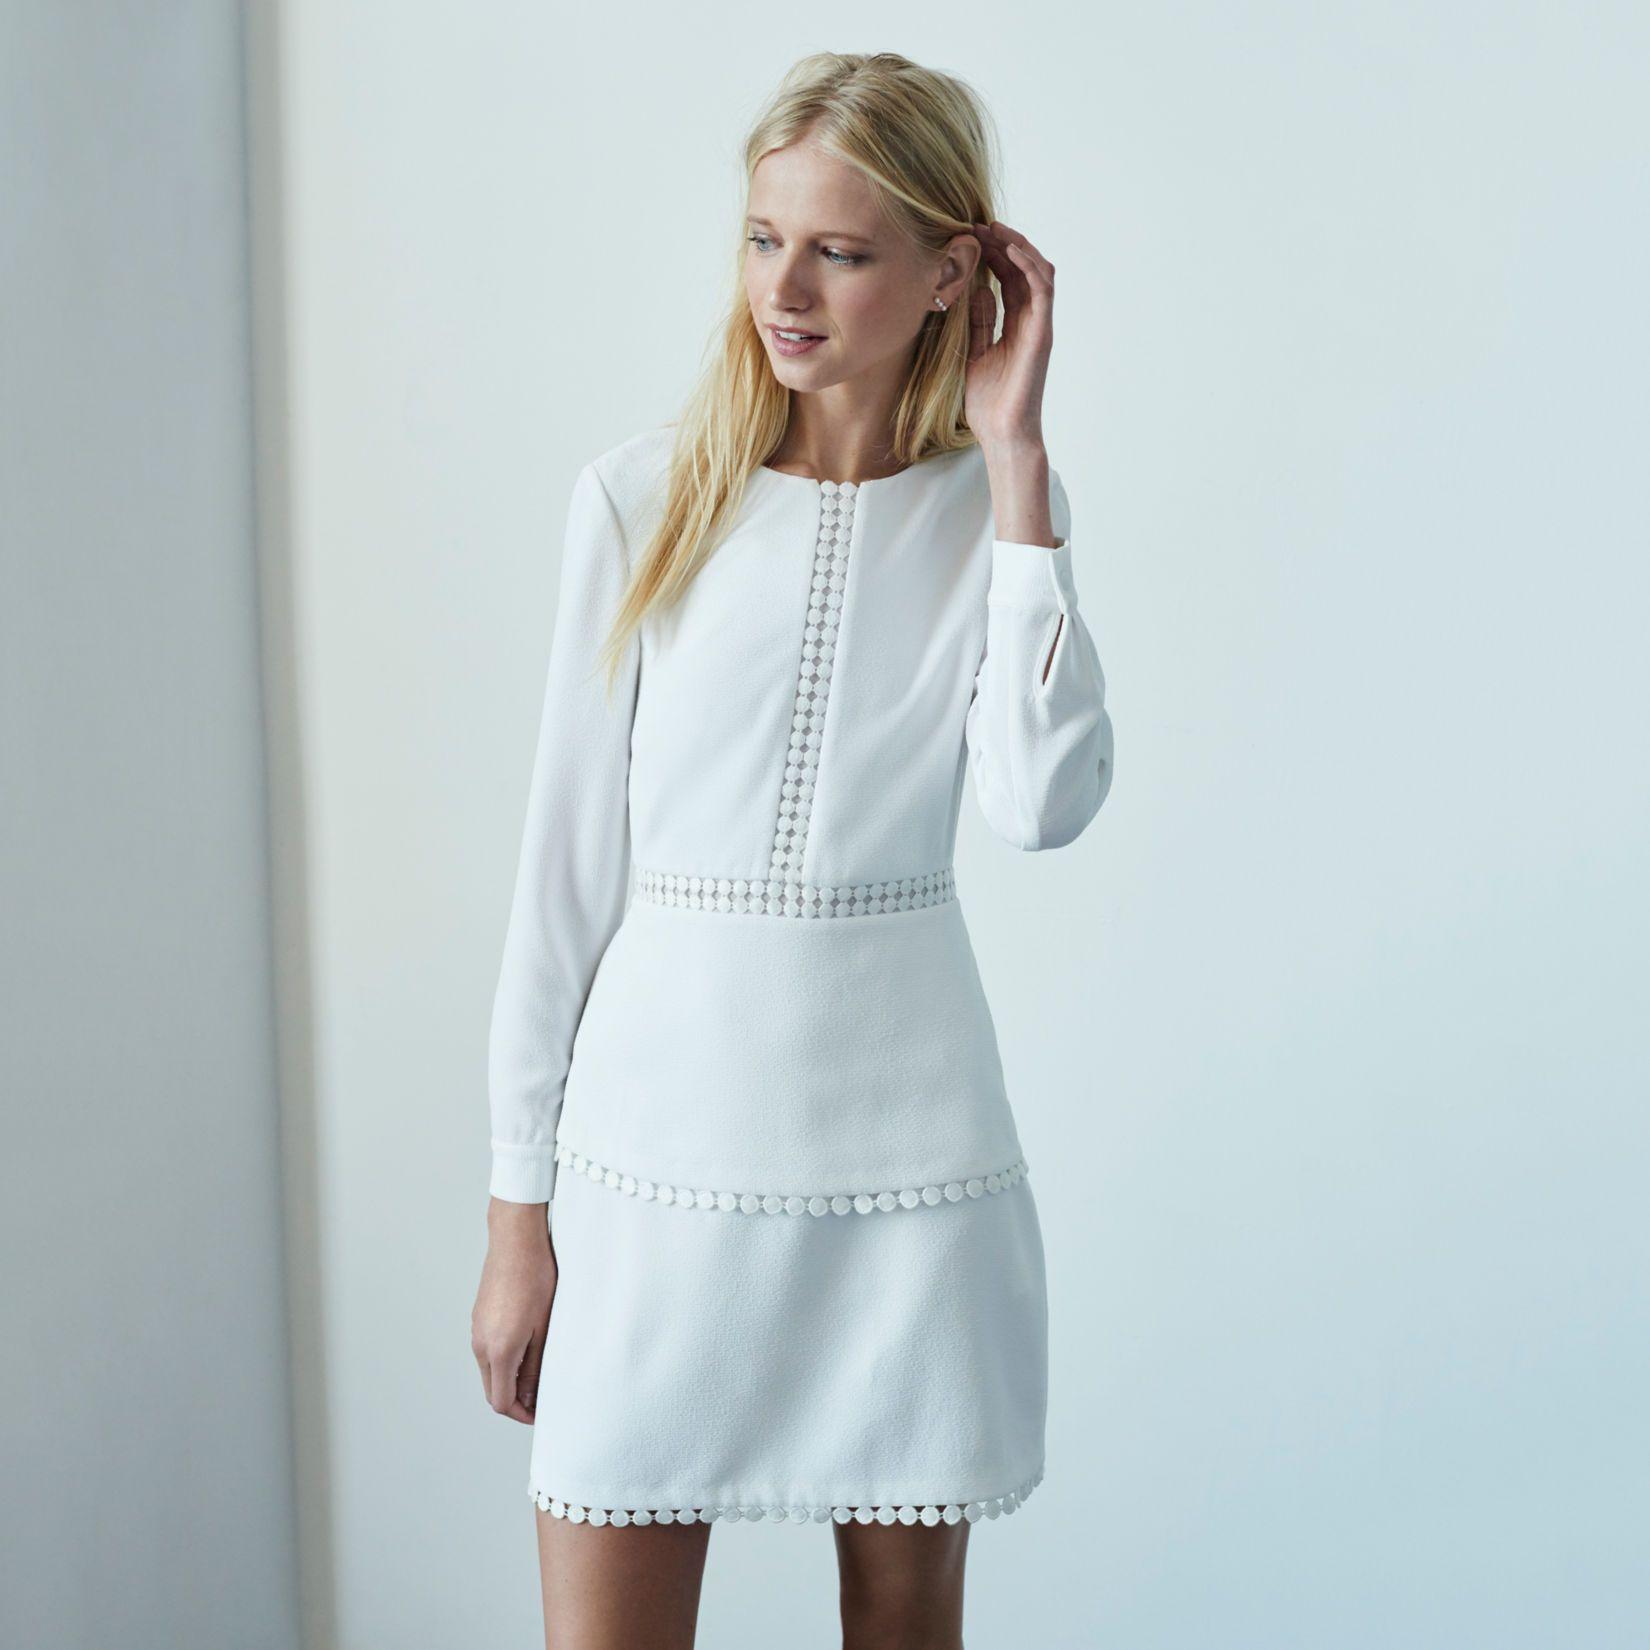 Terrona Tiered Dress - Day to Night Dresses at Club Monaco   Blonder ...